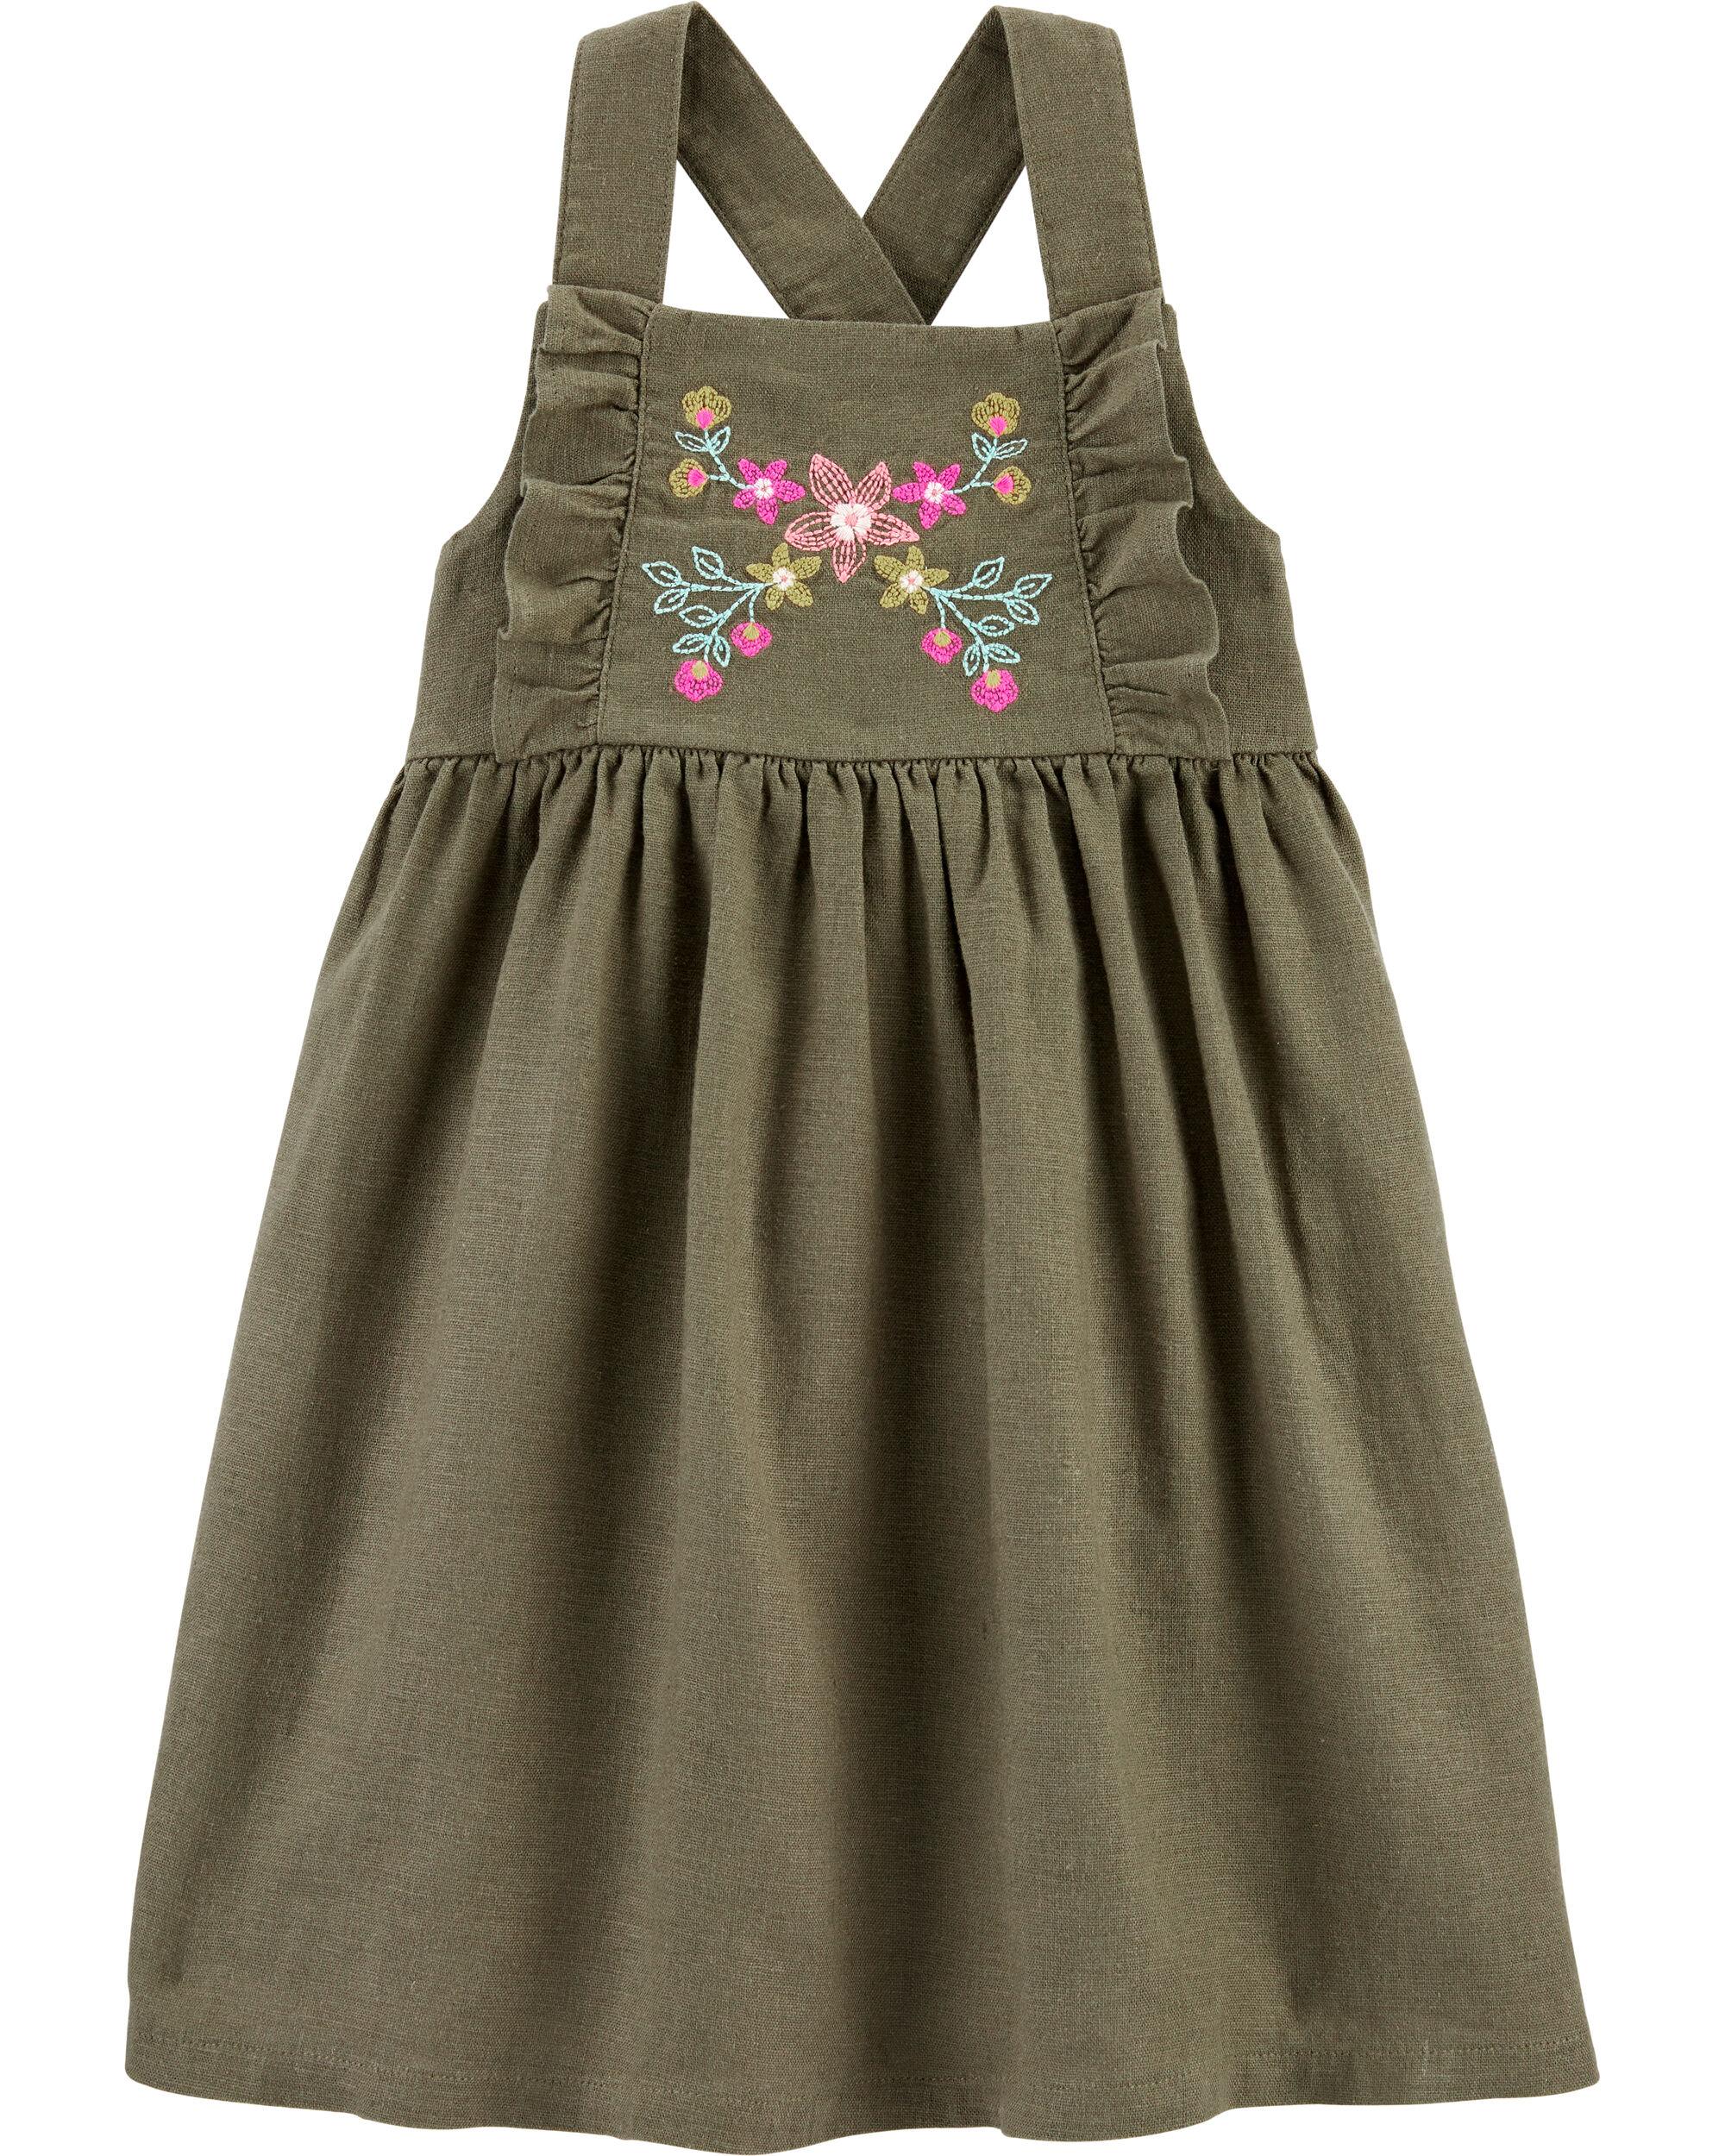 *DOORBUSTER*Embroidered Floral Linen Dress